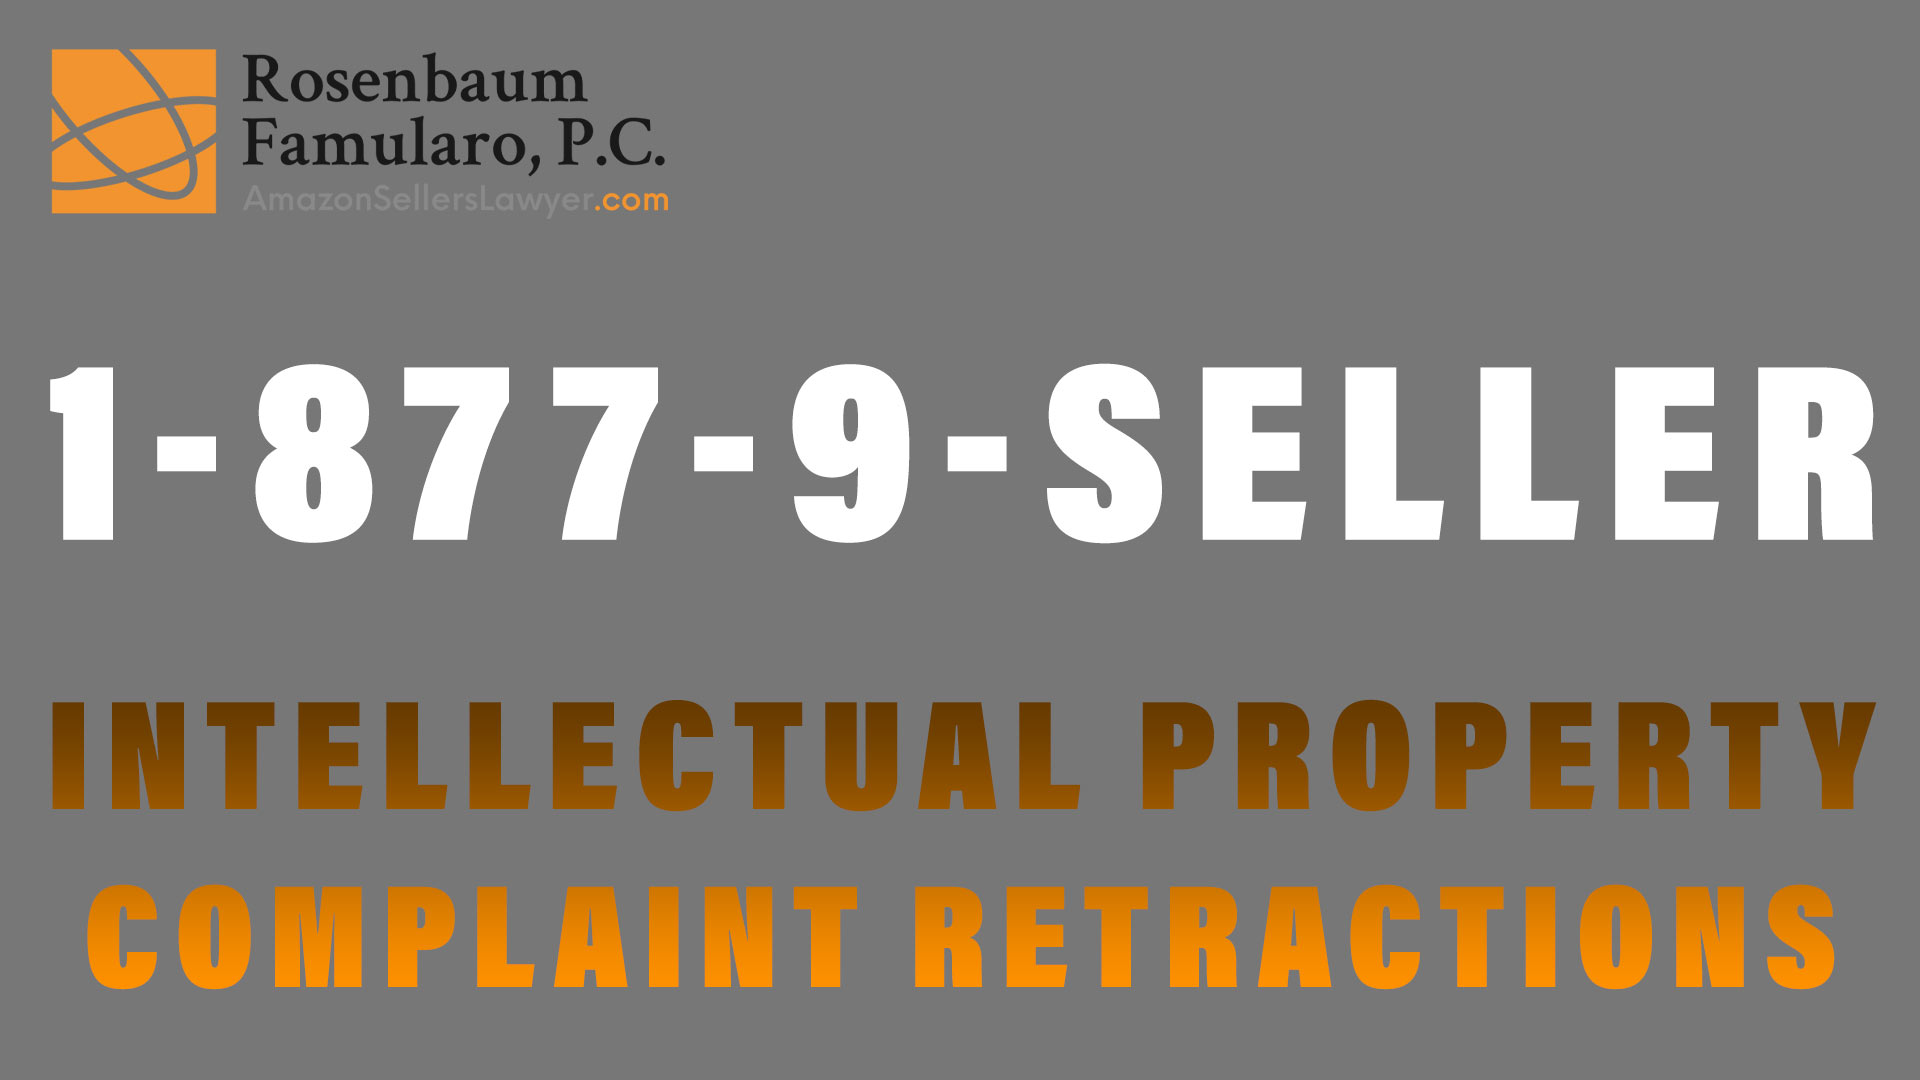 Intellectual Property Complaint Retractions